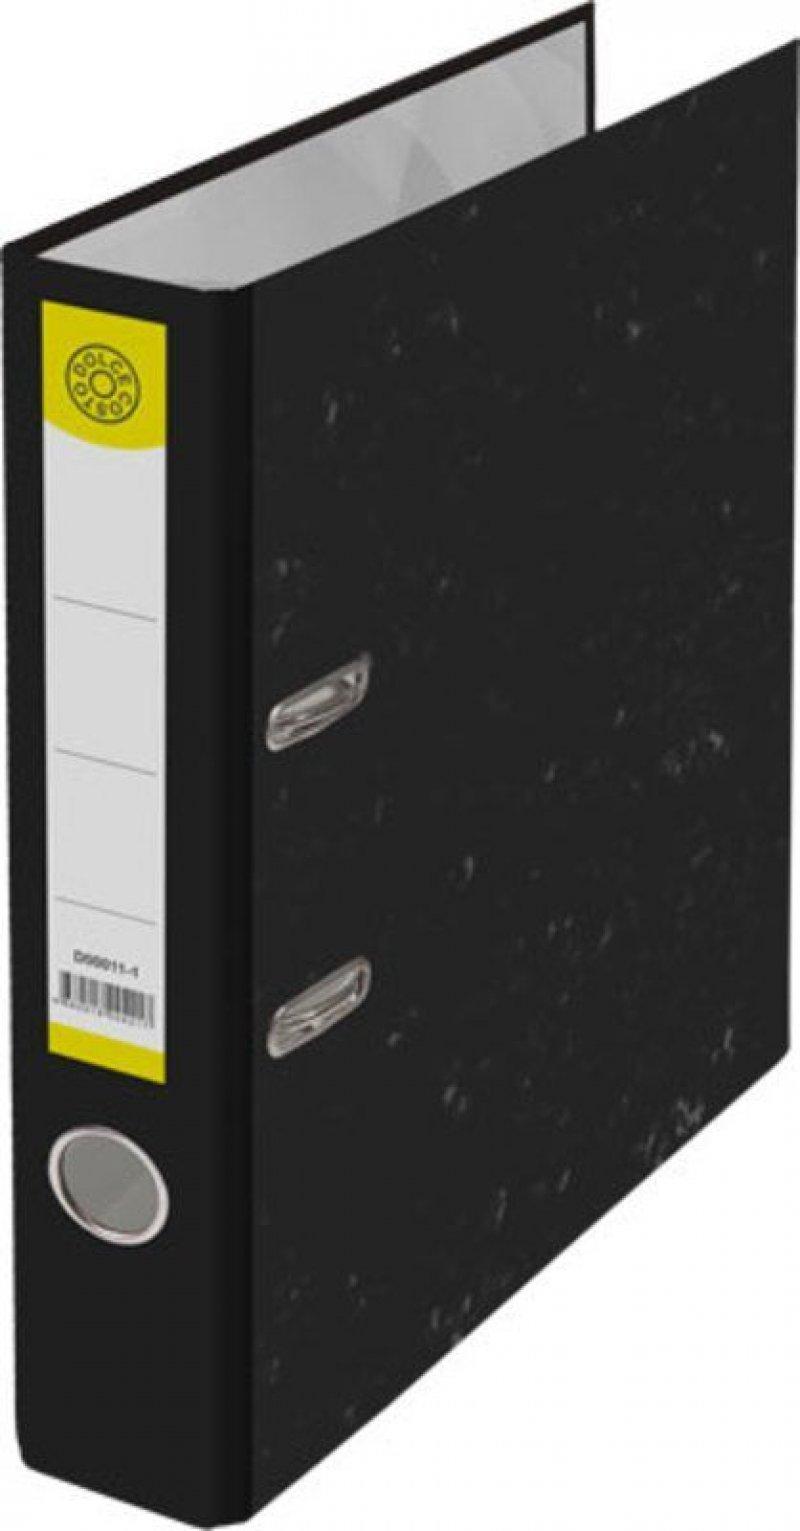 Папка-регистратор 50мм Dolce Costo мрамор черная